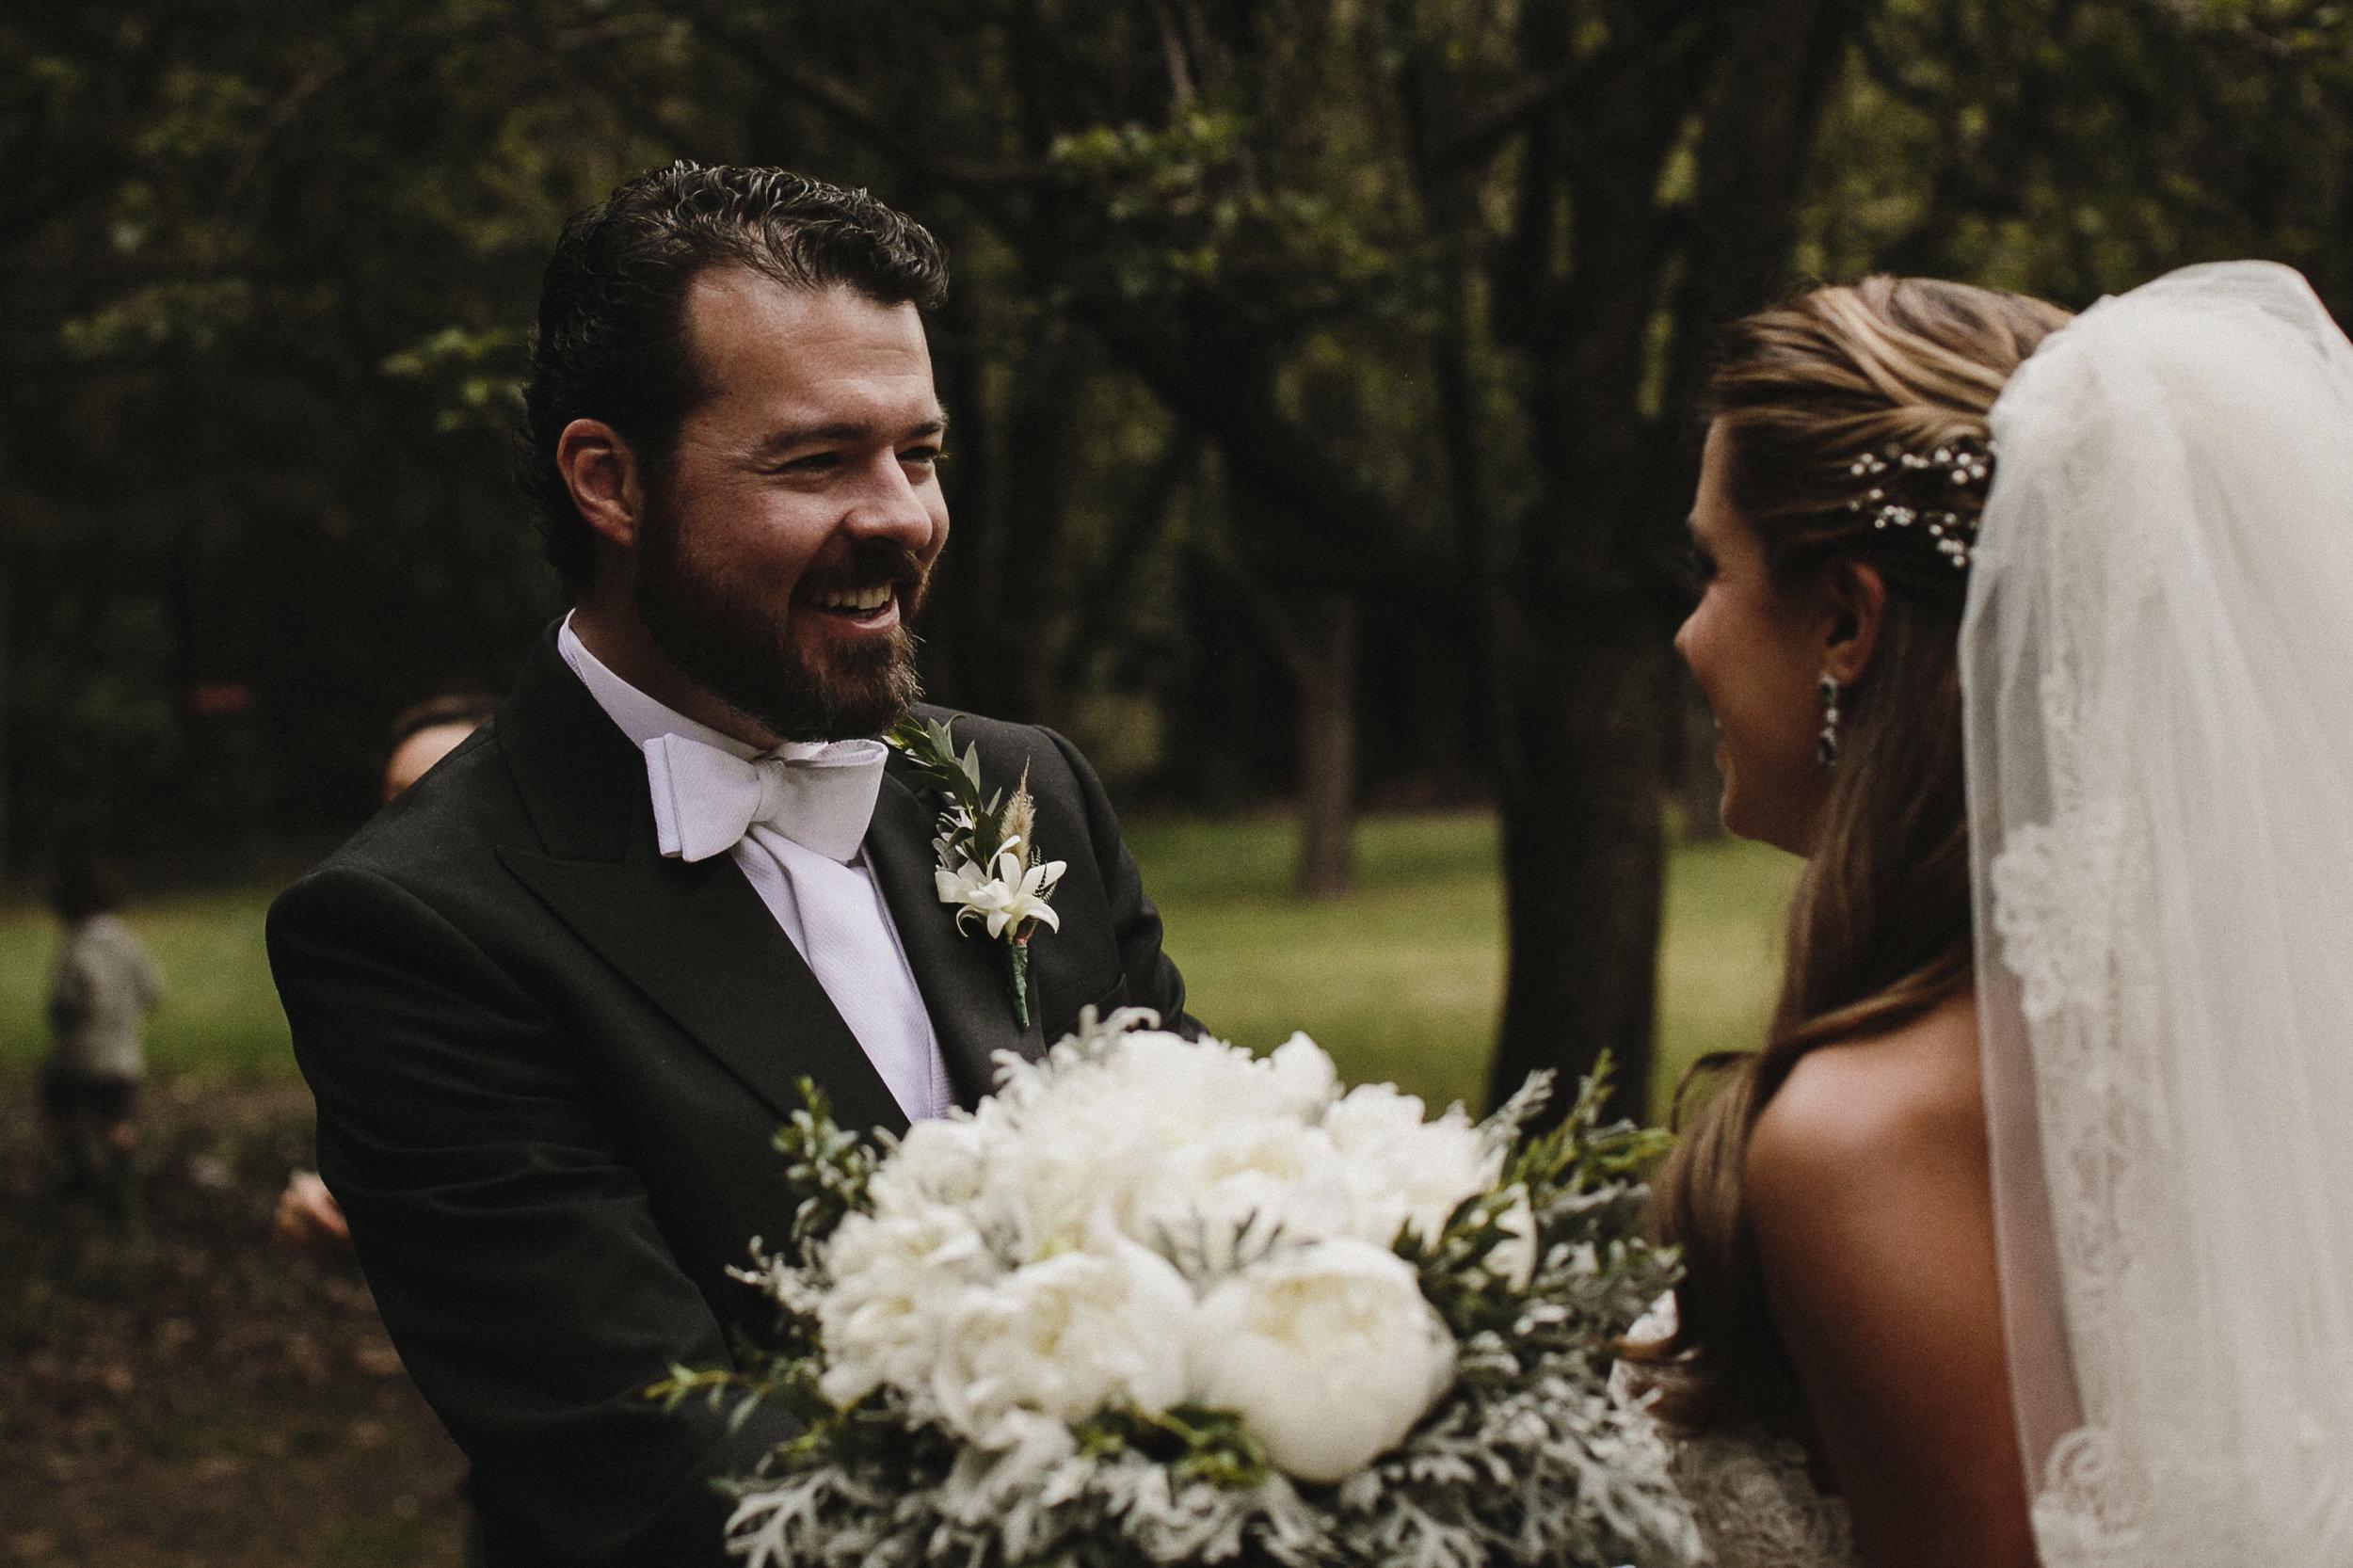 alfonso_flores_destination_wedding_photogrpahy_paola_alonso-175.JPG